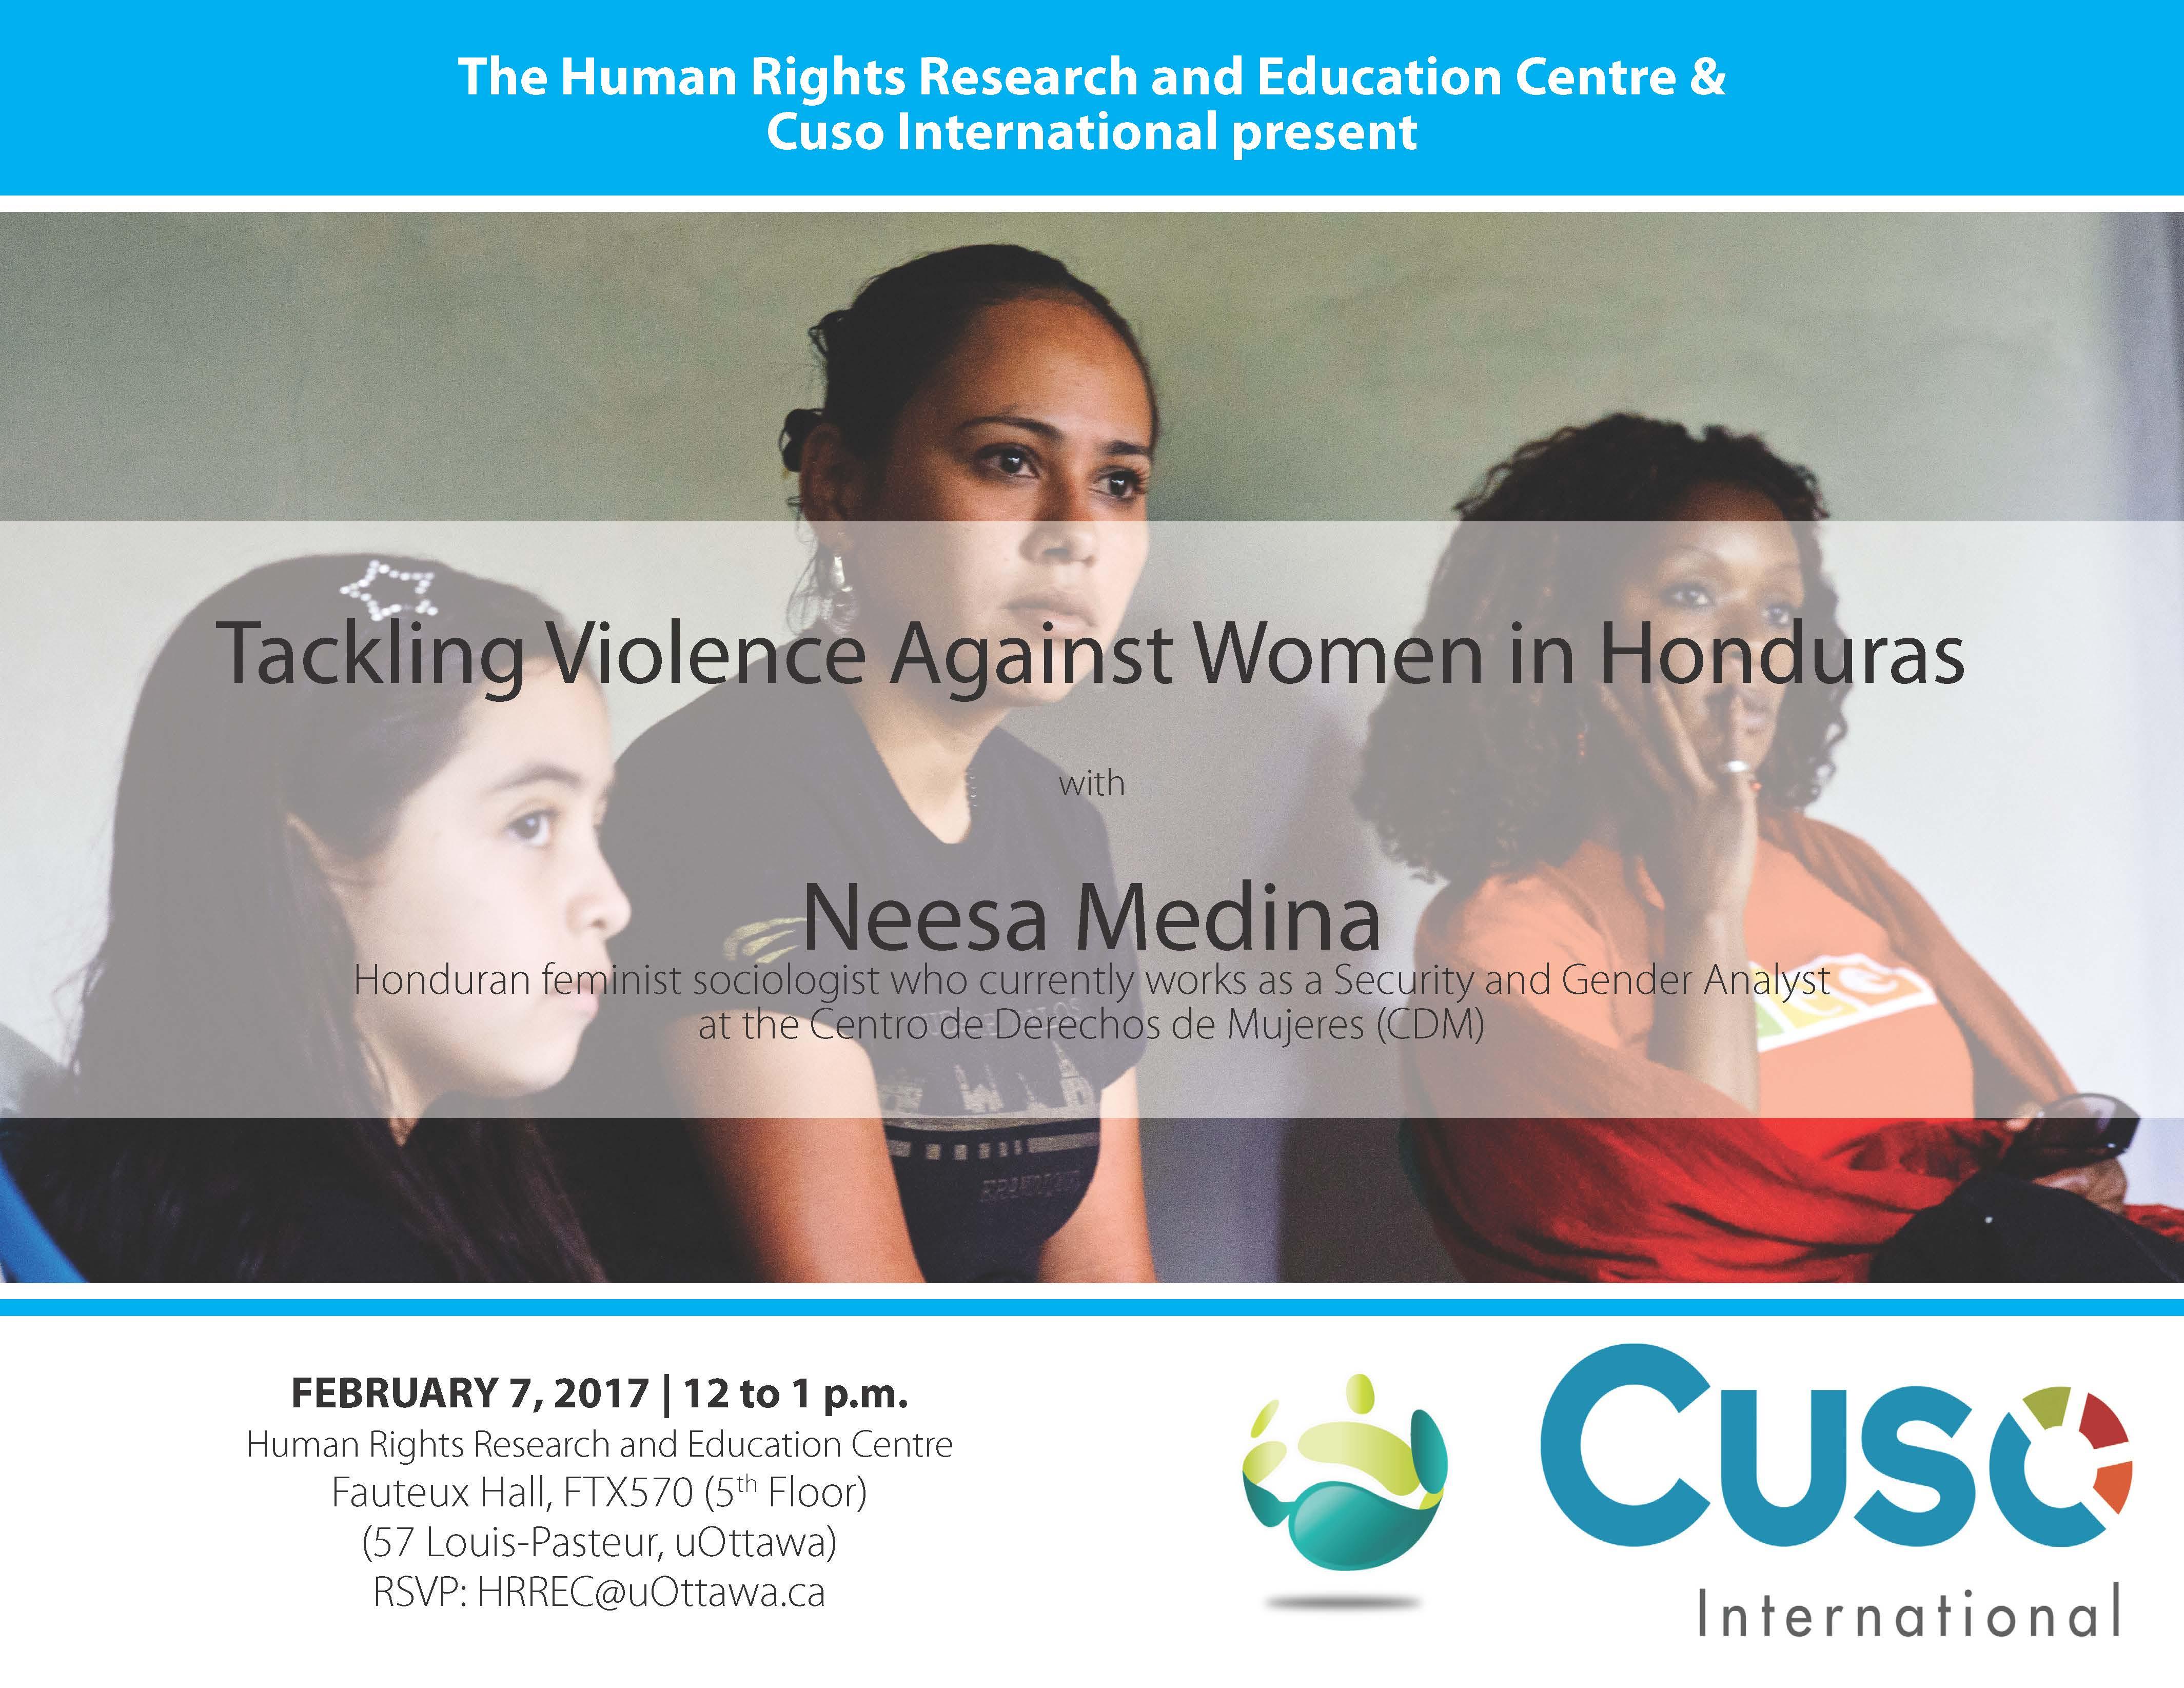 Tackling Violence against Women in Honduras